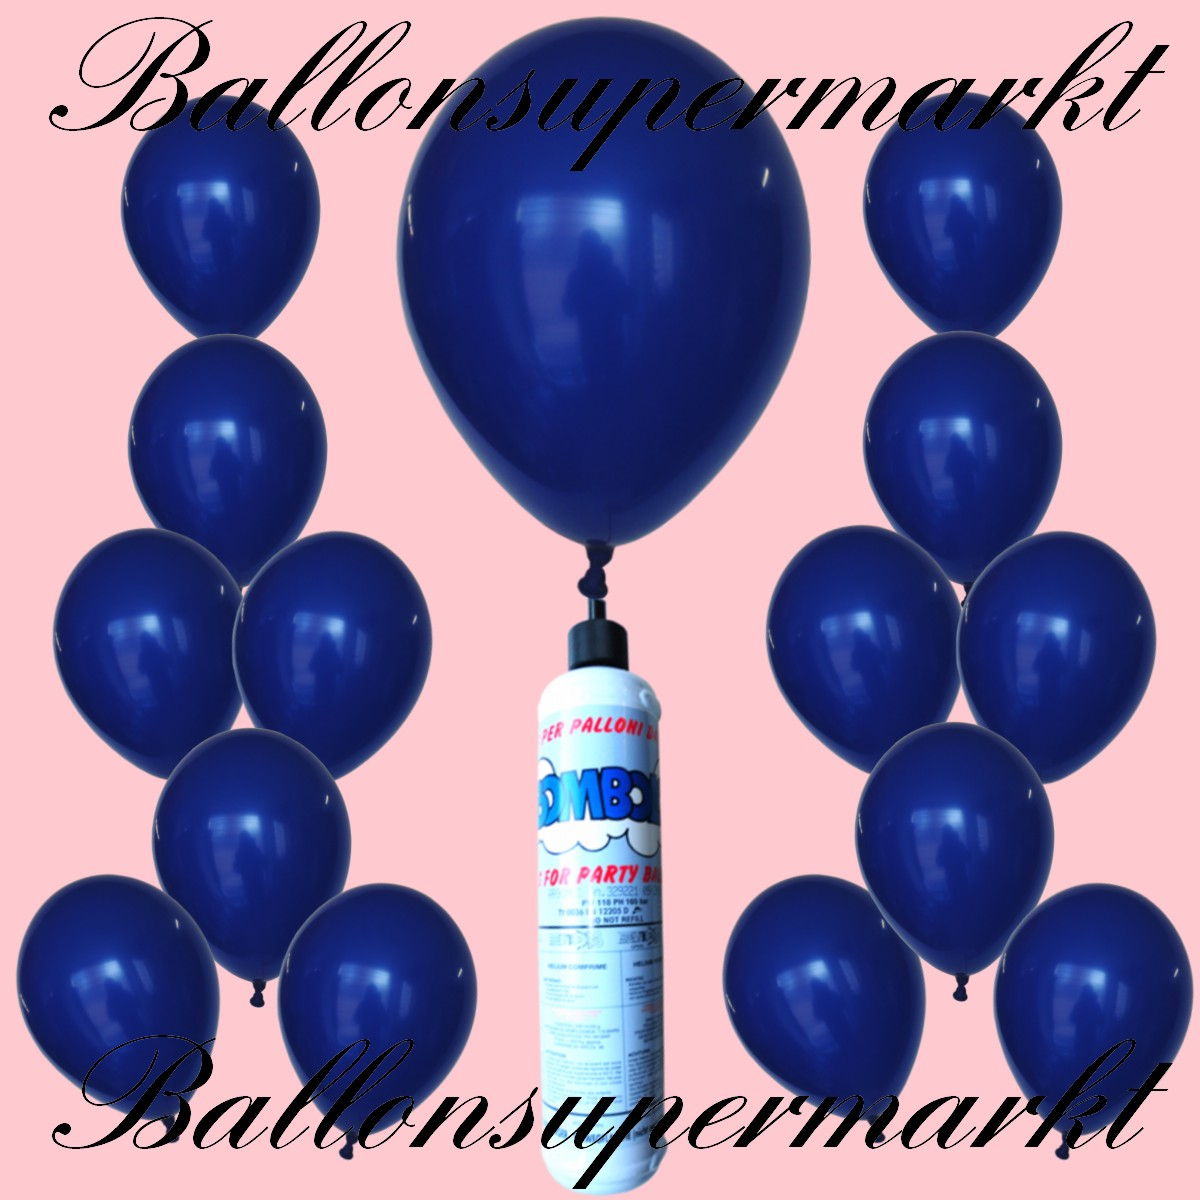 luftballons helium set miniflasche latex luftballons in marineblau lu luftballons helium mini. Black Bedroom Furniture Sets. Home Design Ideas